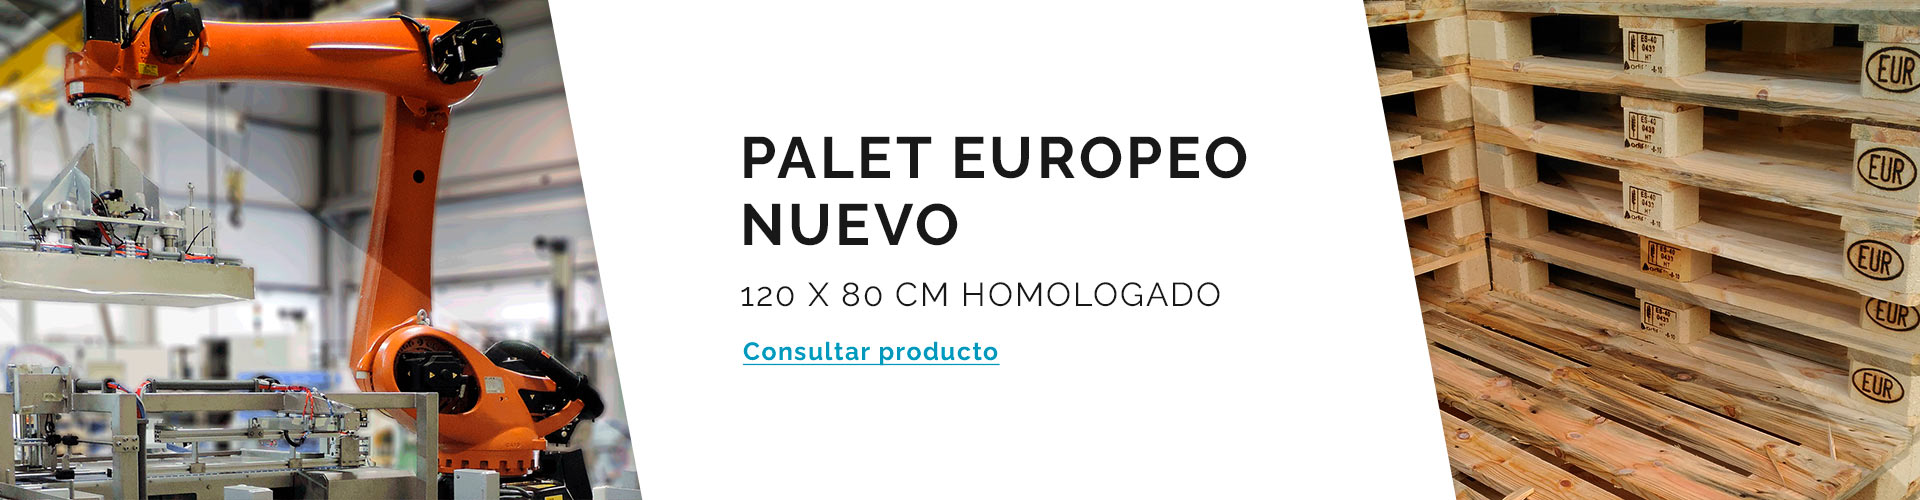 Palet Europeo Nuevo